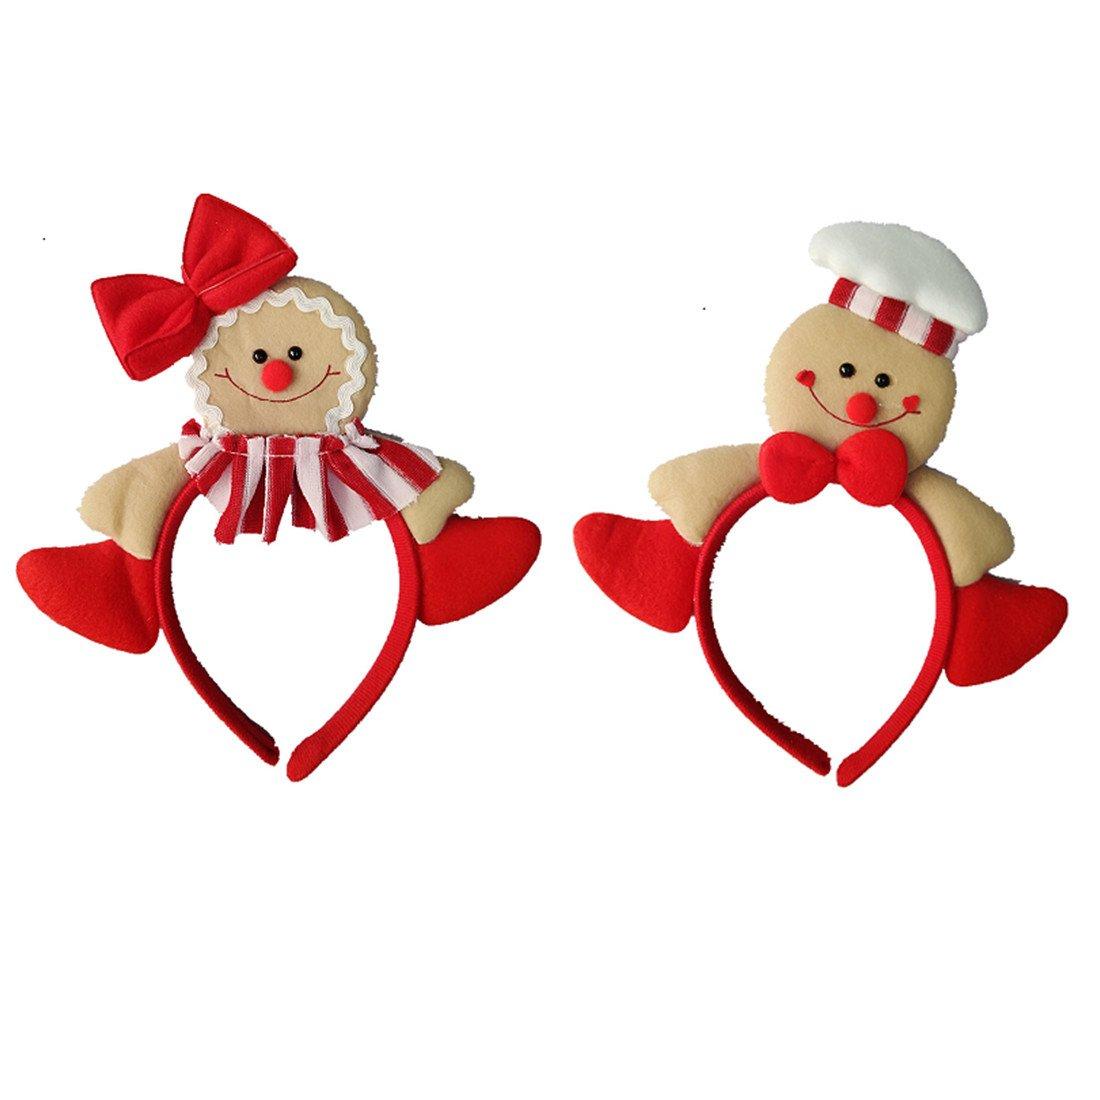 Zerowin Christmas Gingerbread Man Style Hair Hoop Xmas Hair Accessory Headwear Cute Cartoon Headband Christmas Holiday Party Supplies Gifts Style